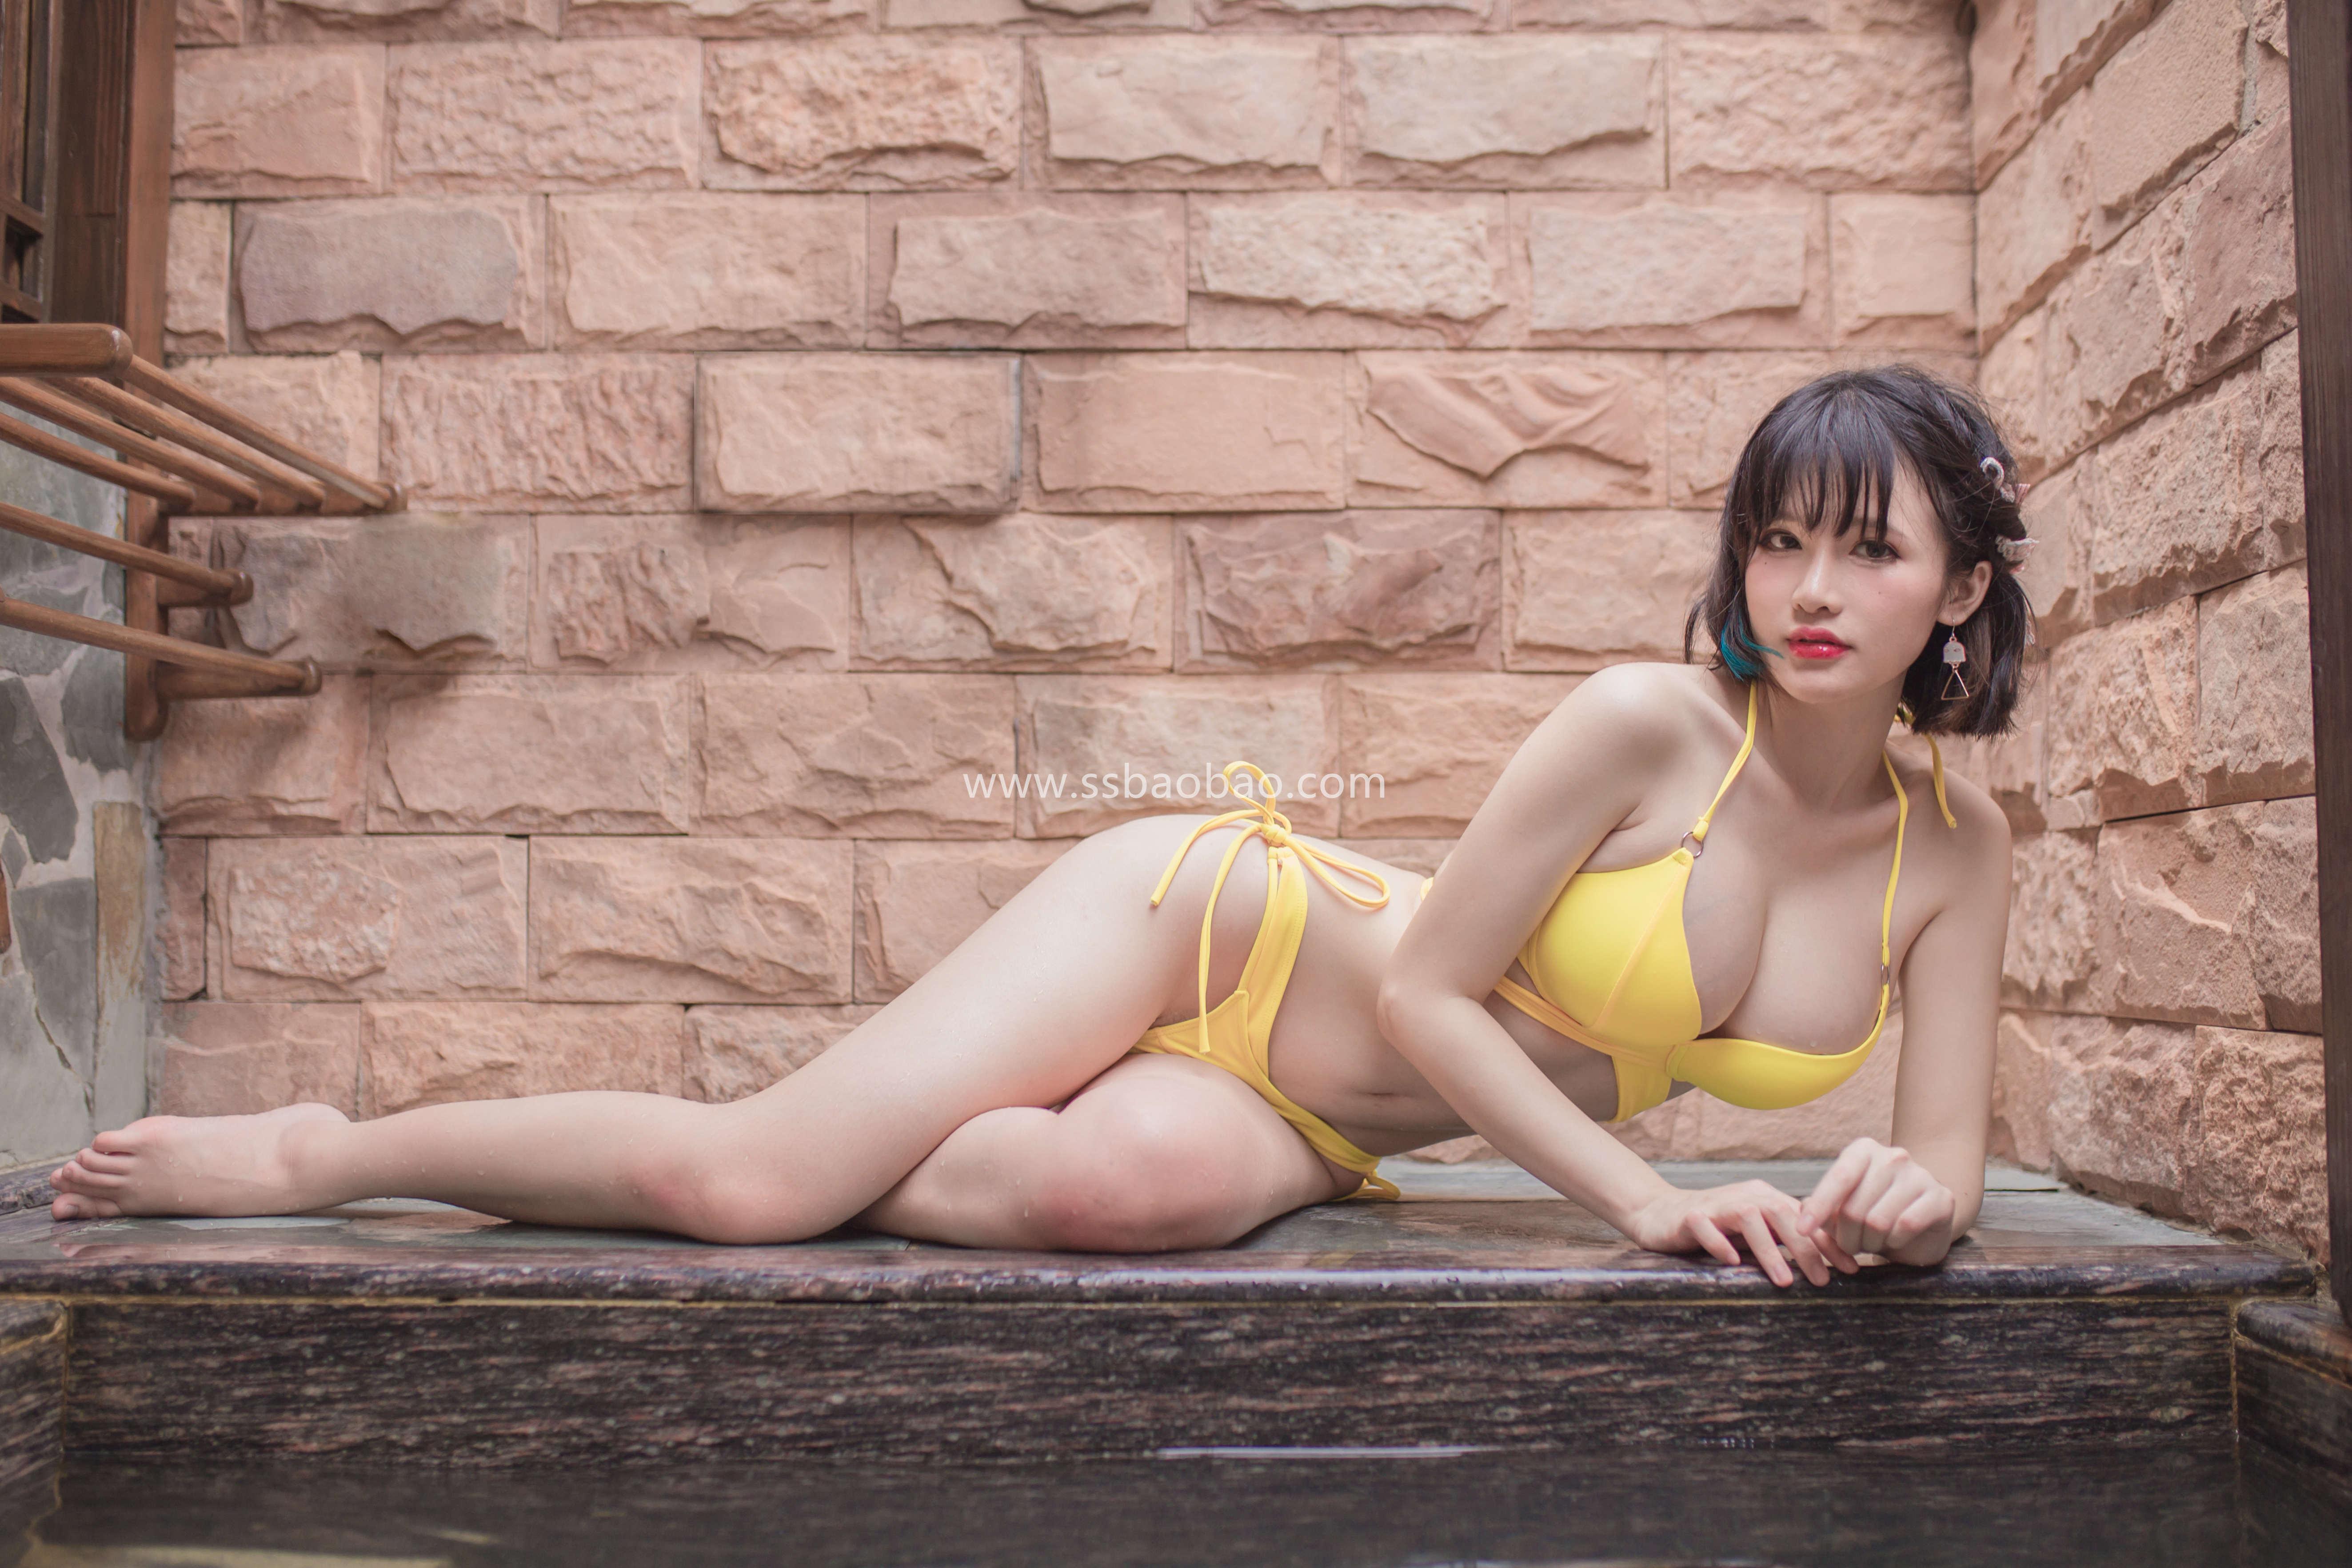 Yoko宅夏 - 妹汤物语(泳装) [55P-423MB]05